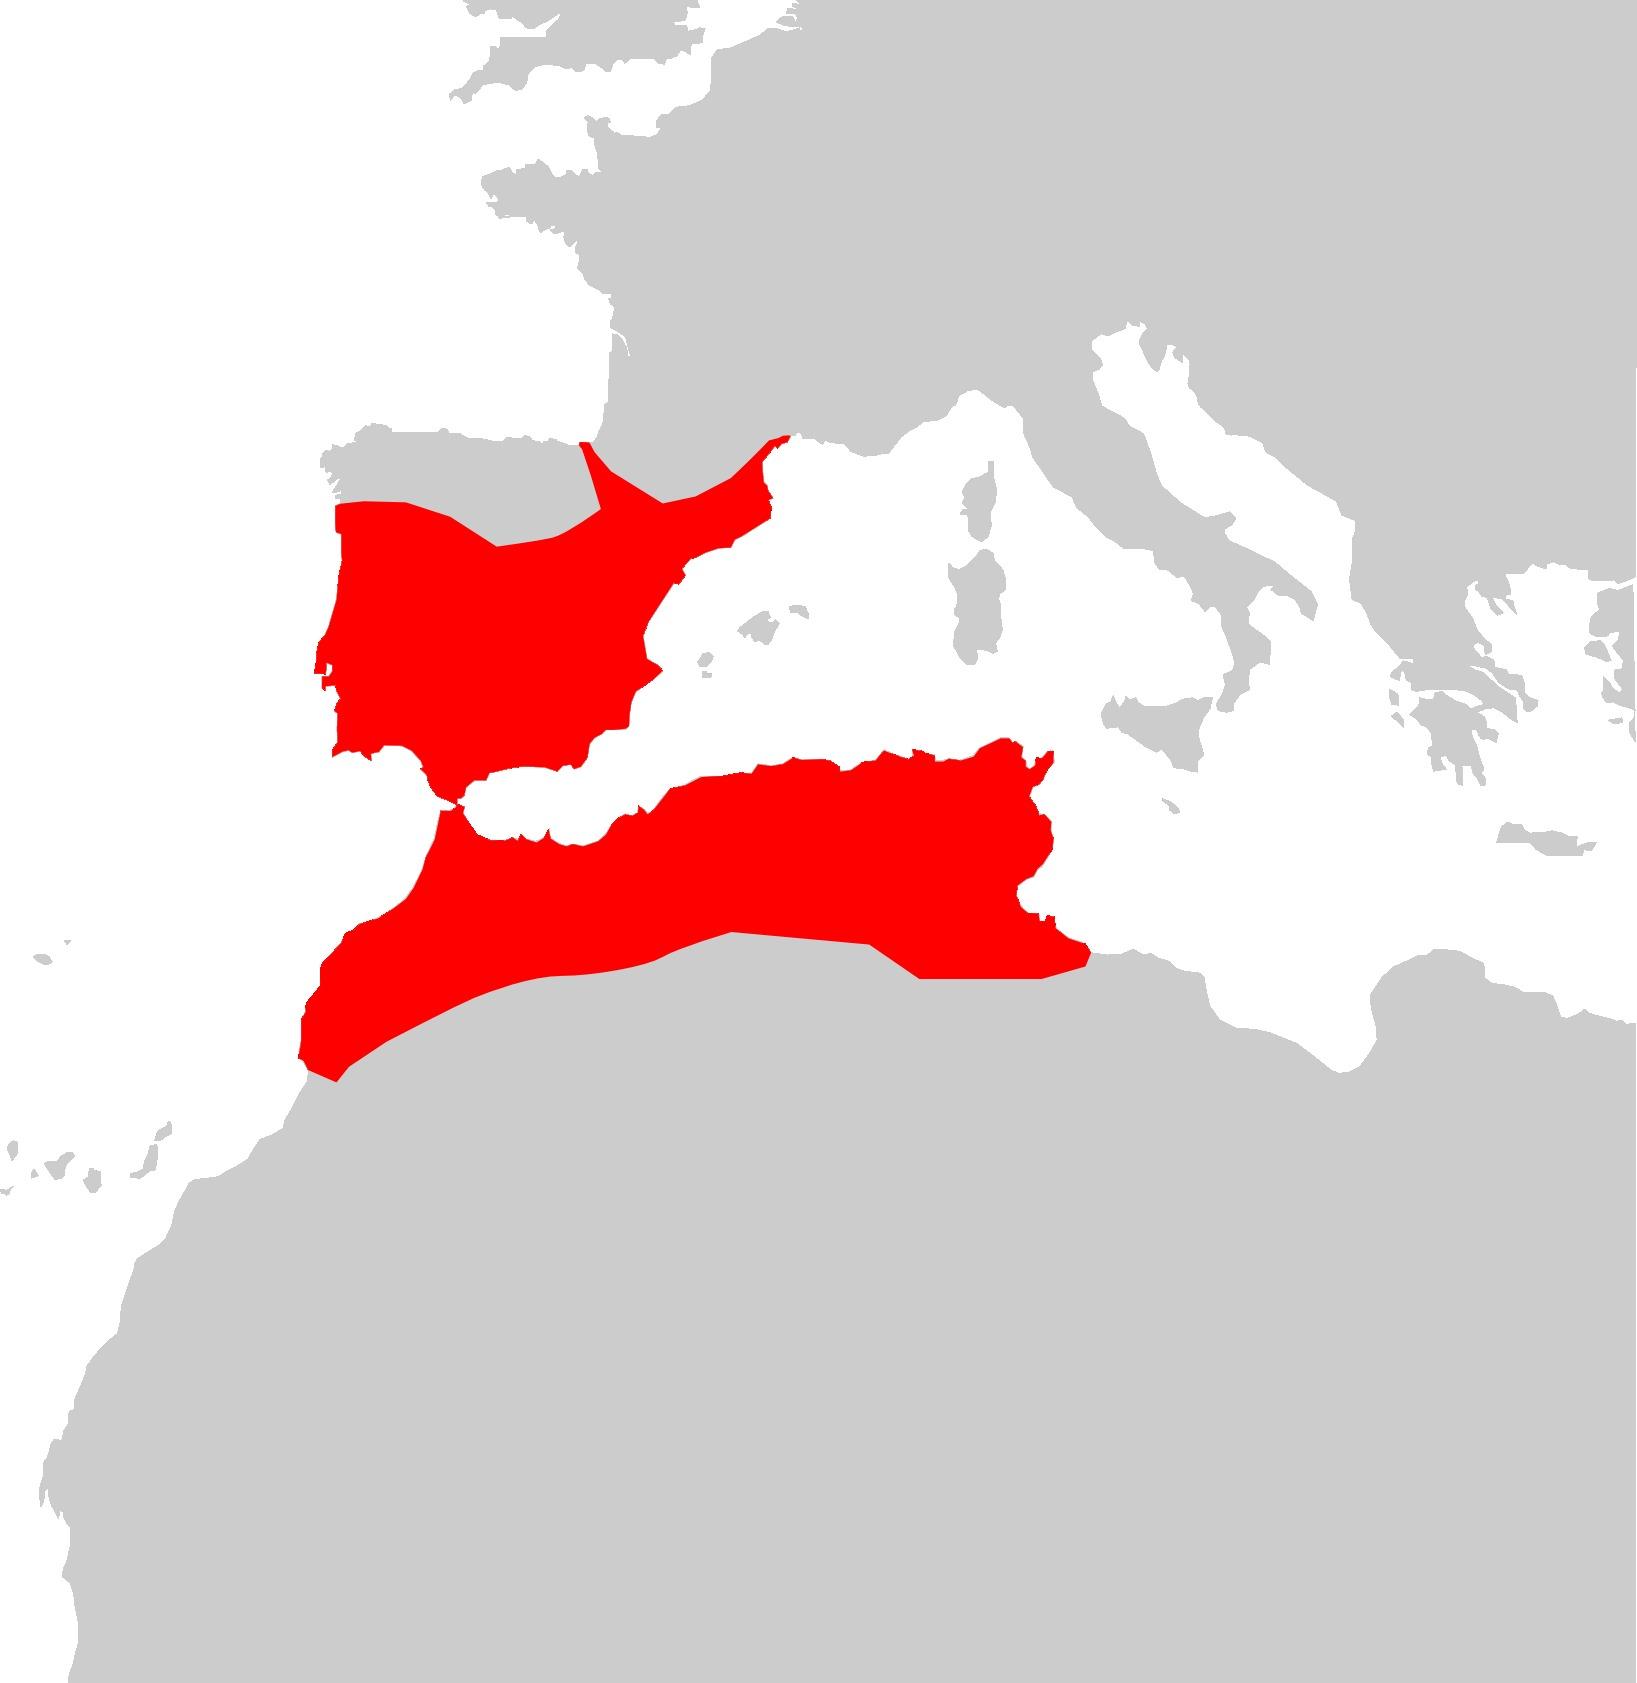 "<span class=""translation_missing"" title=""translation missing: en.medium.untitled.map_image_of, page_name: Spanish pond turtle"">Map Image Of</span>"